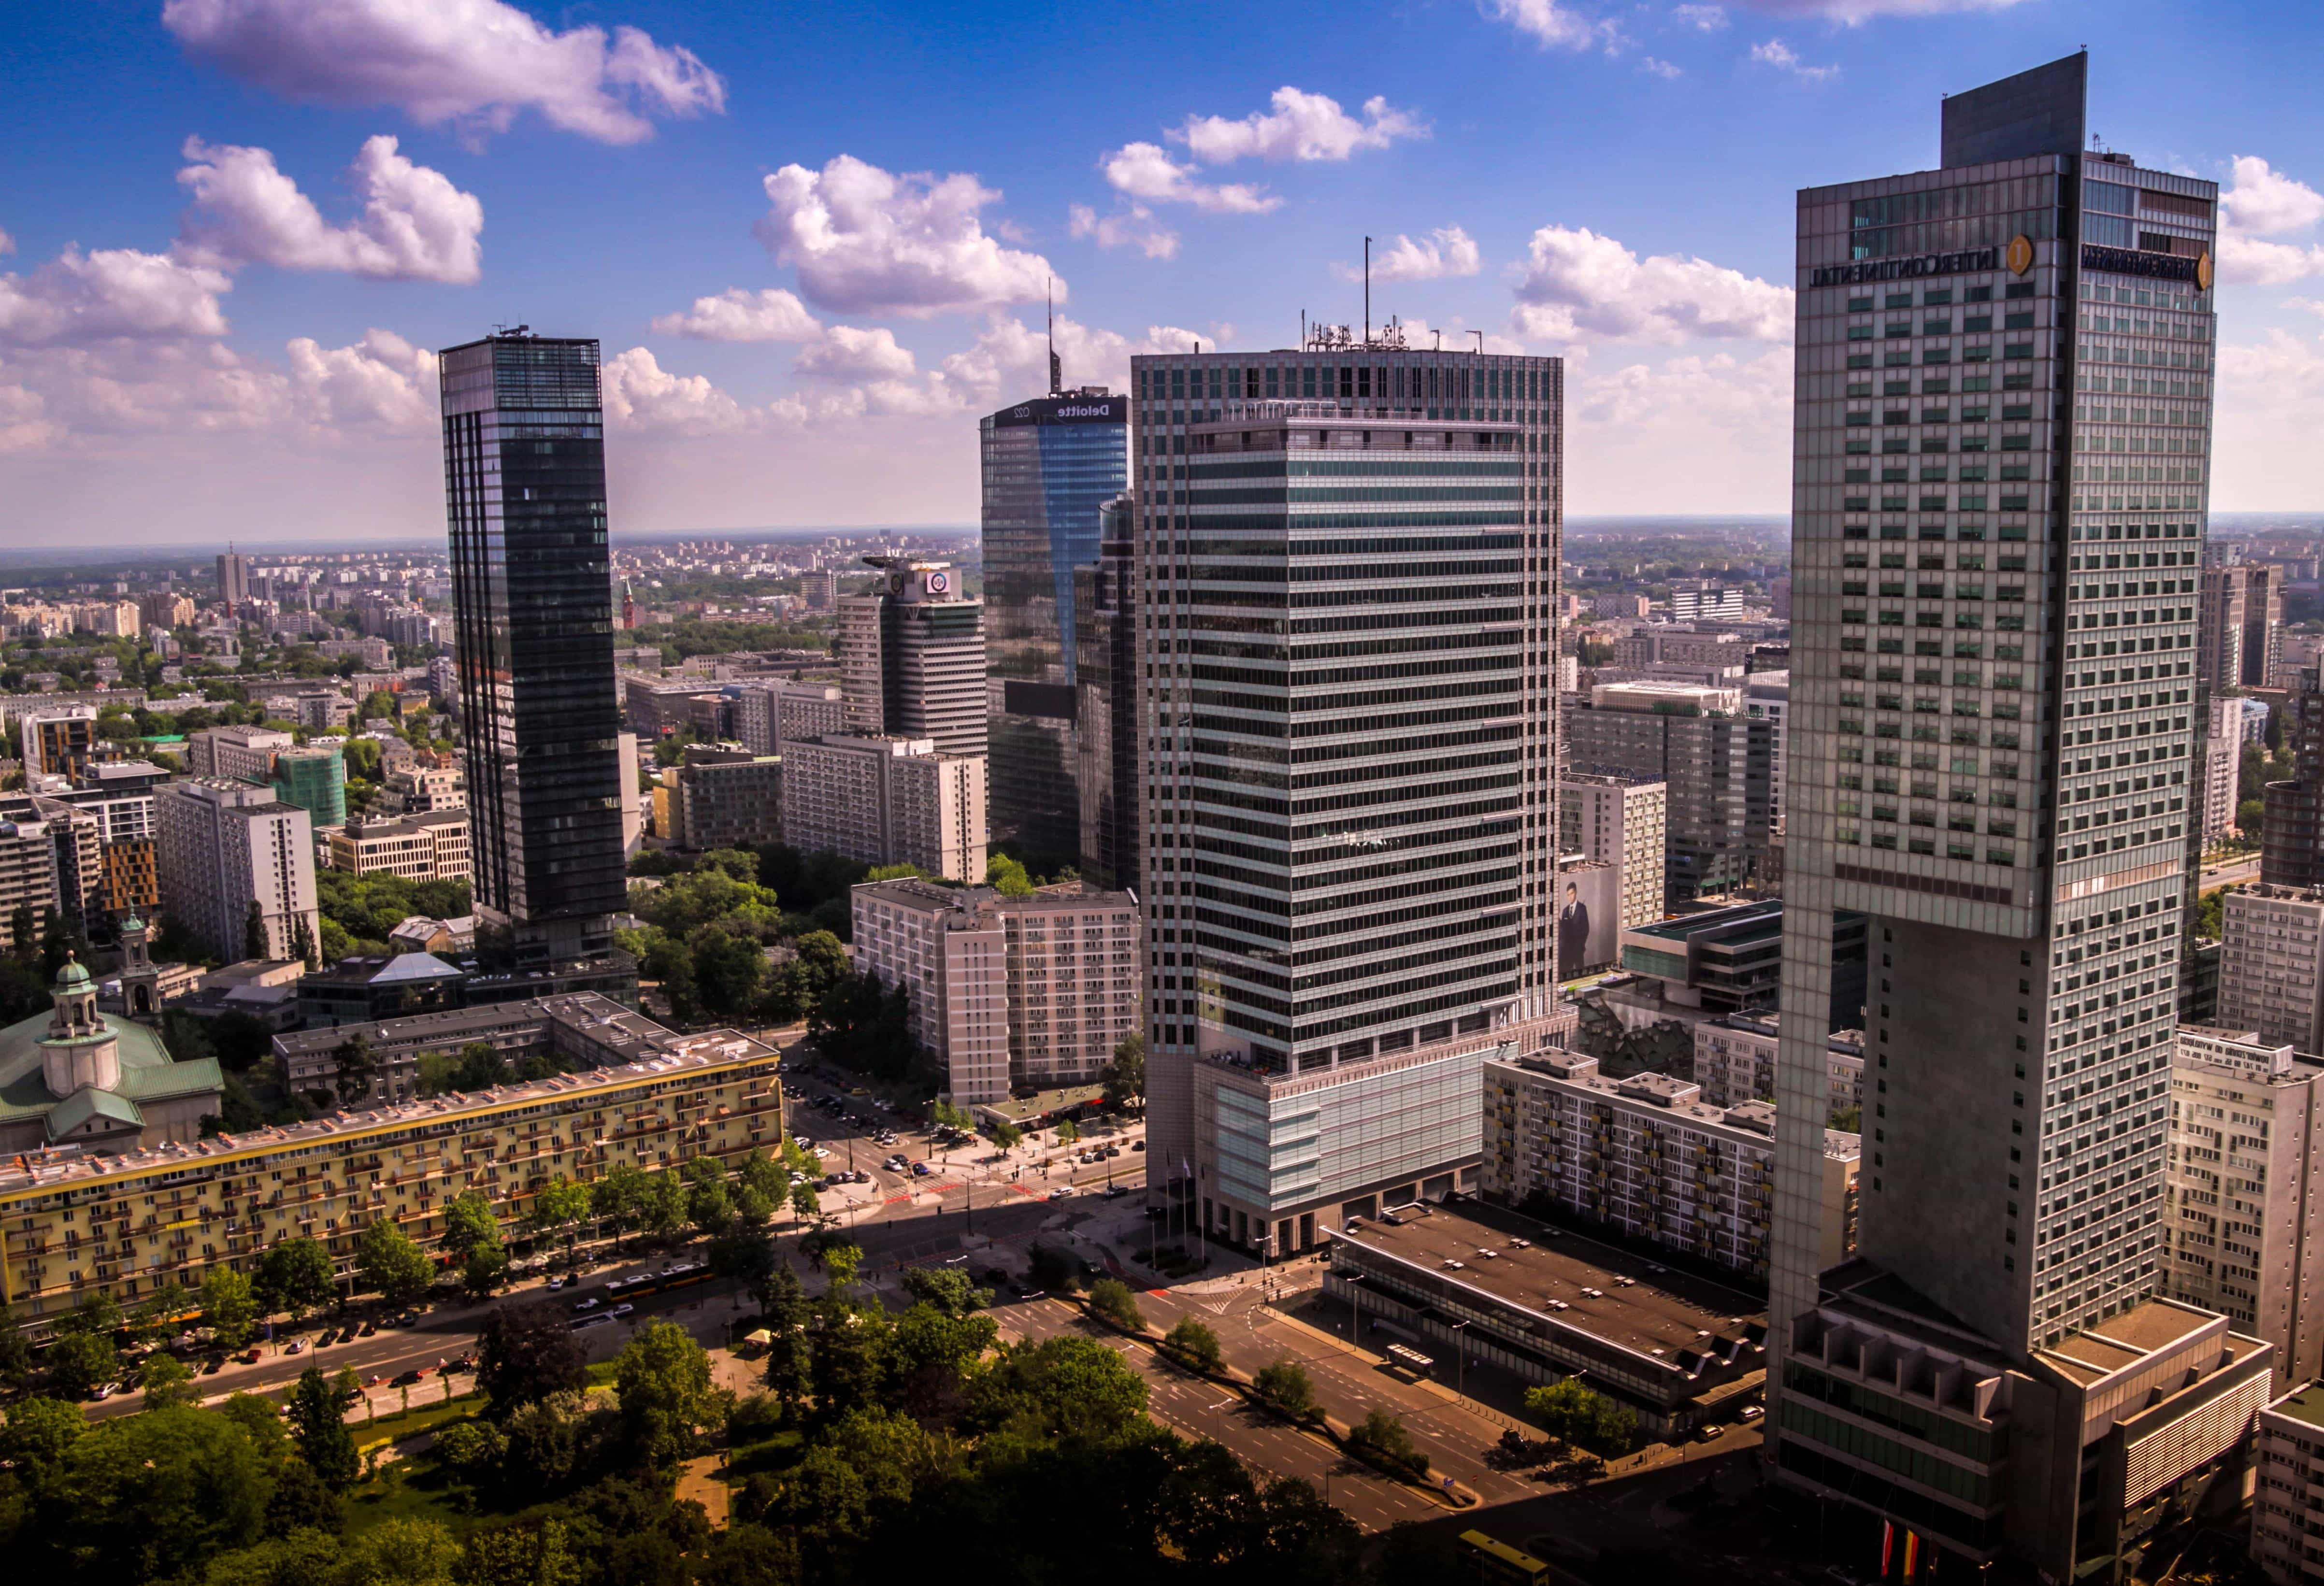 city, architecture, building, blue sky, metropolis, cityscape, downtown,  modern, urban